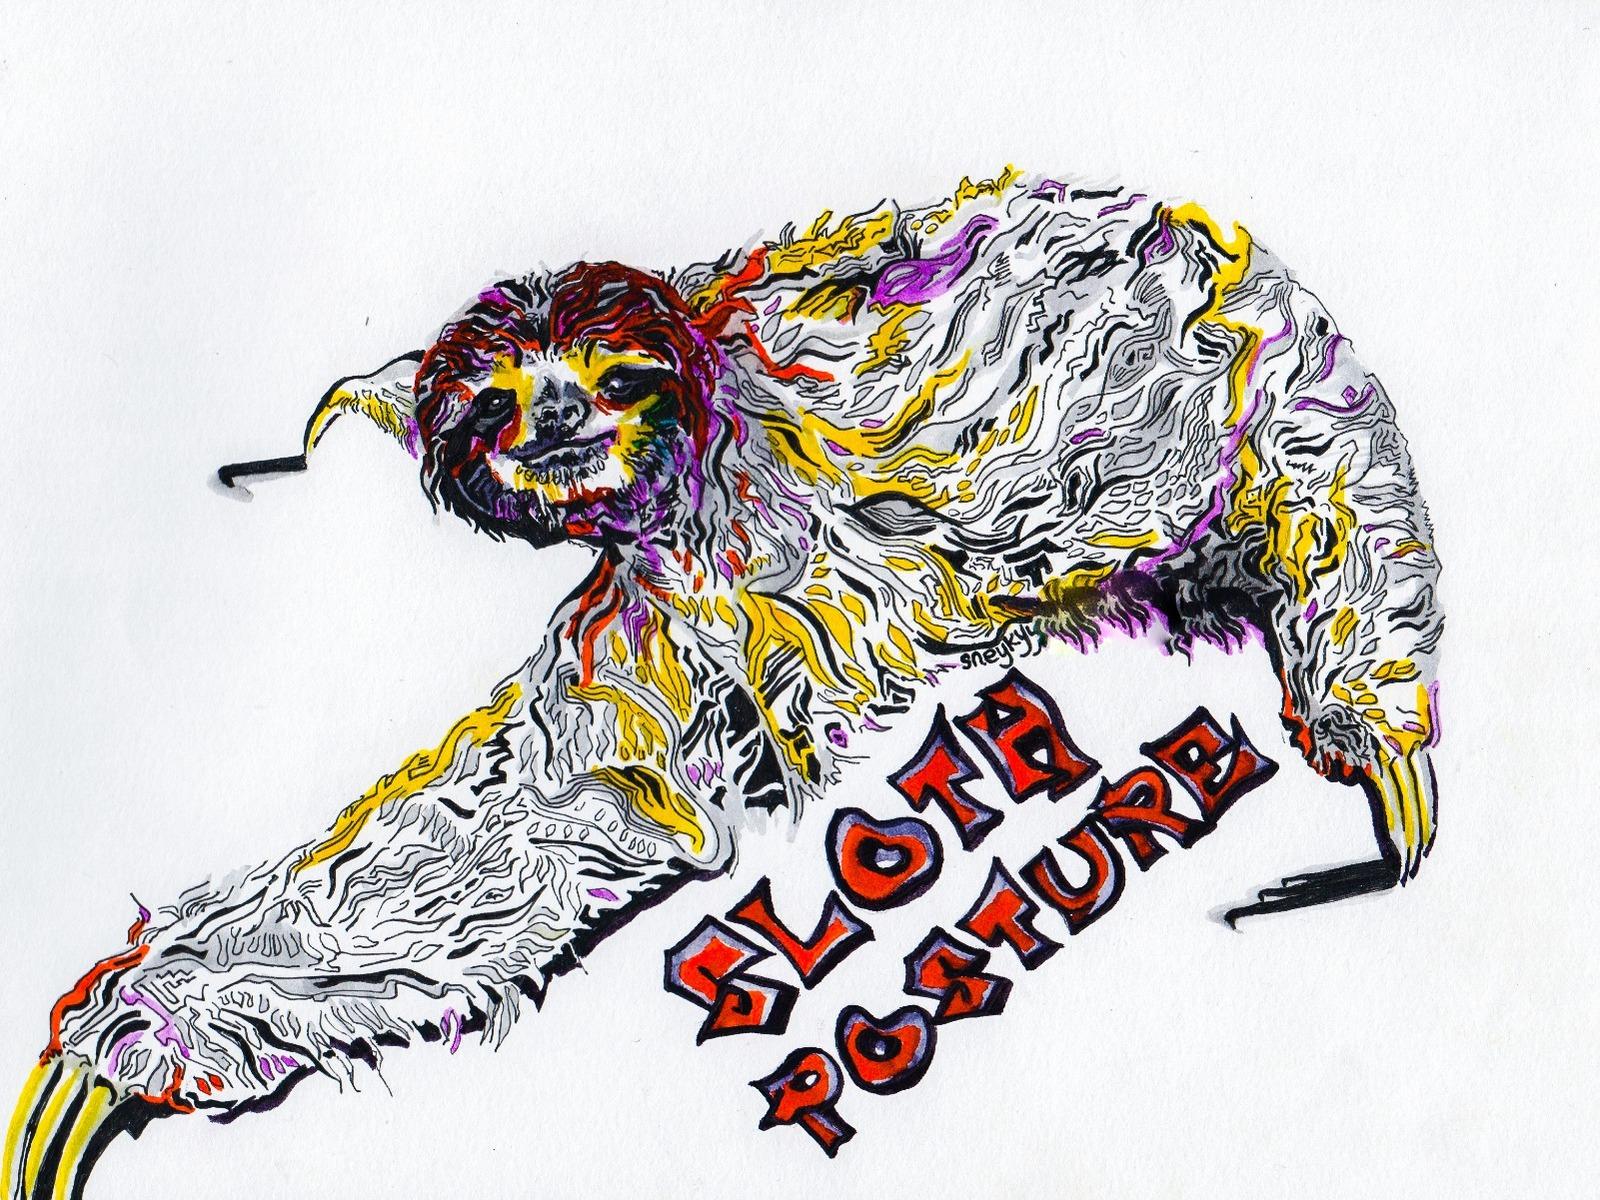 Sloth Posture